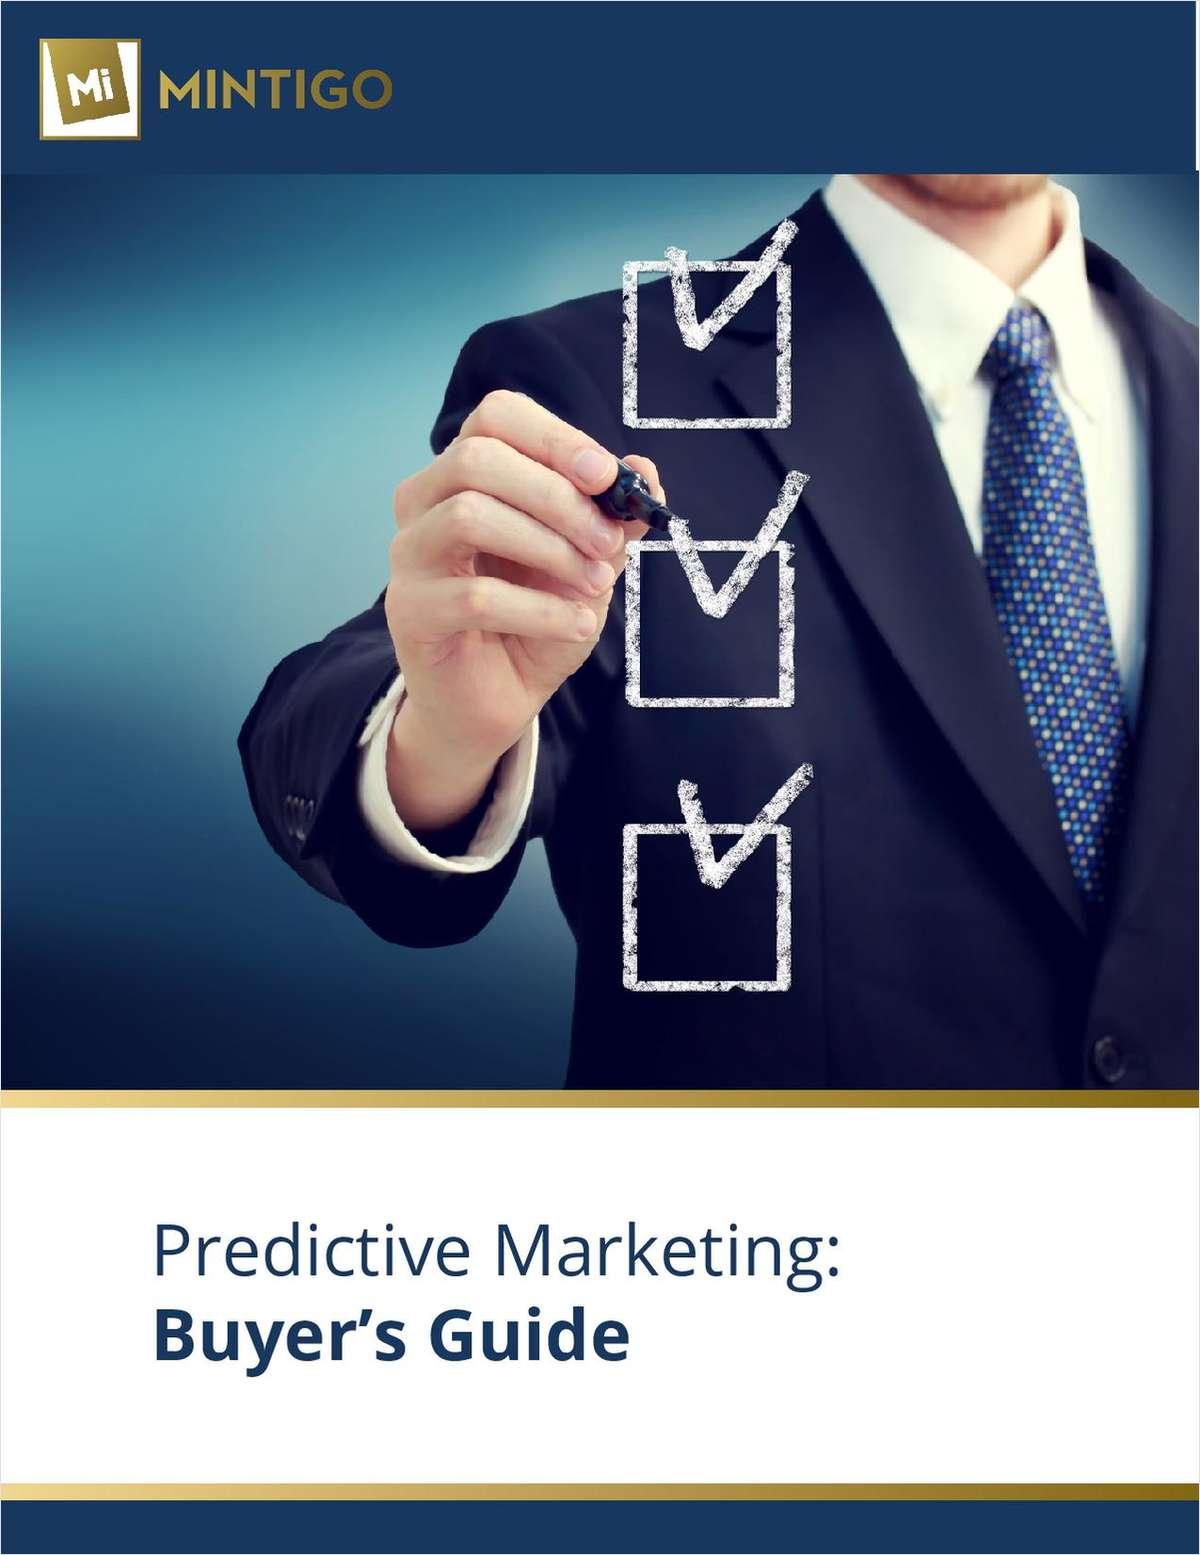 Predictive Marketing Buyer's Guide